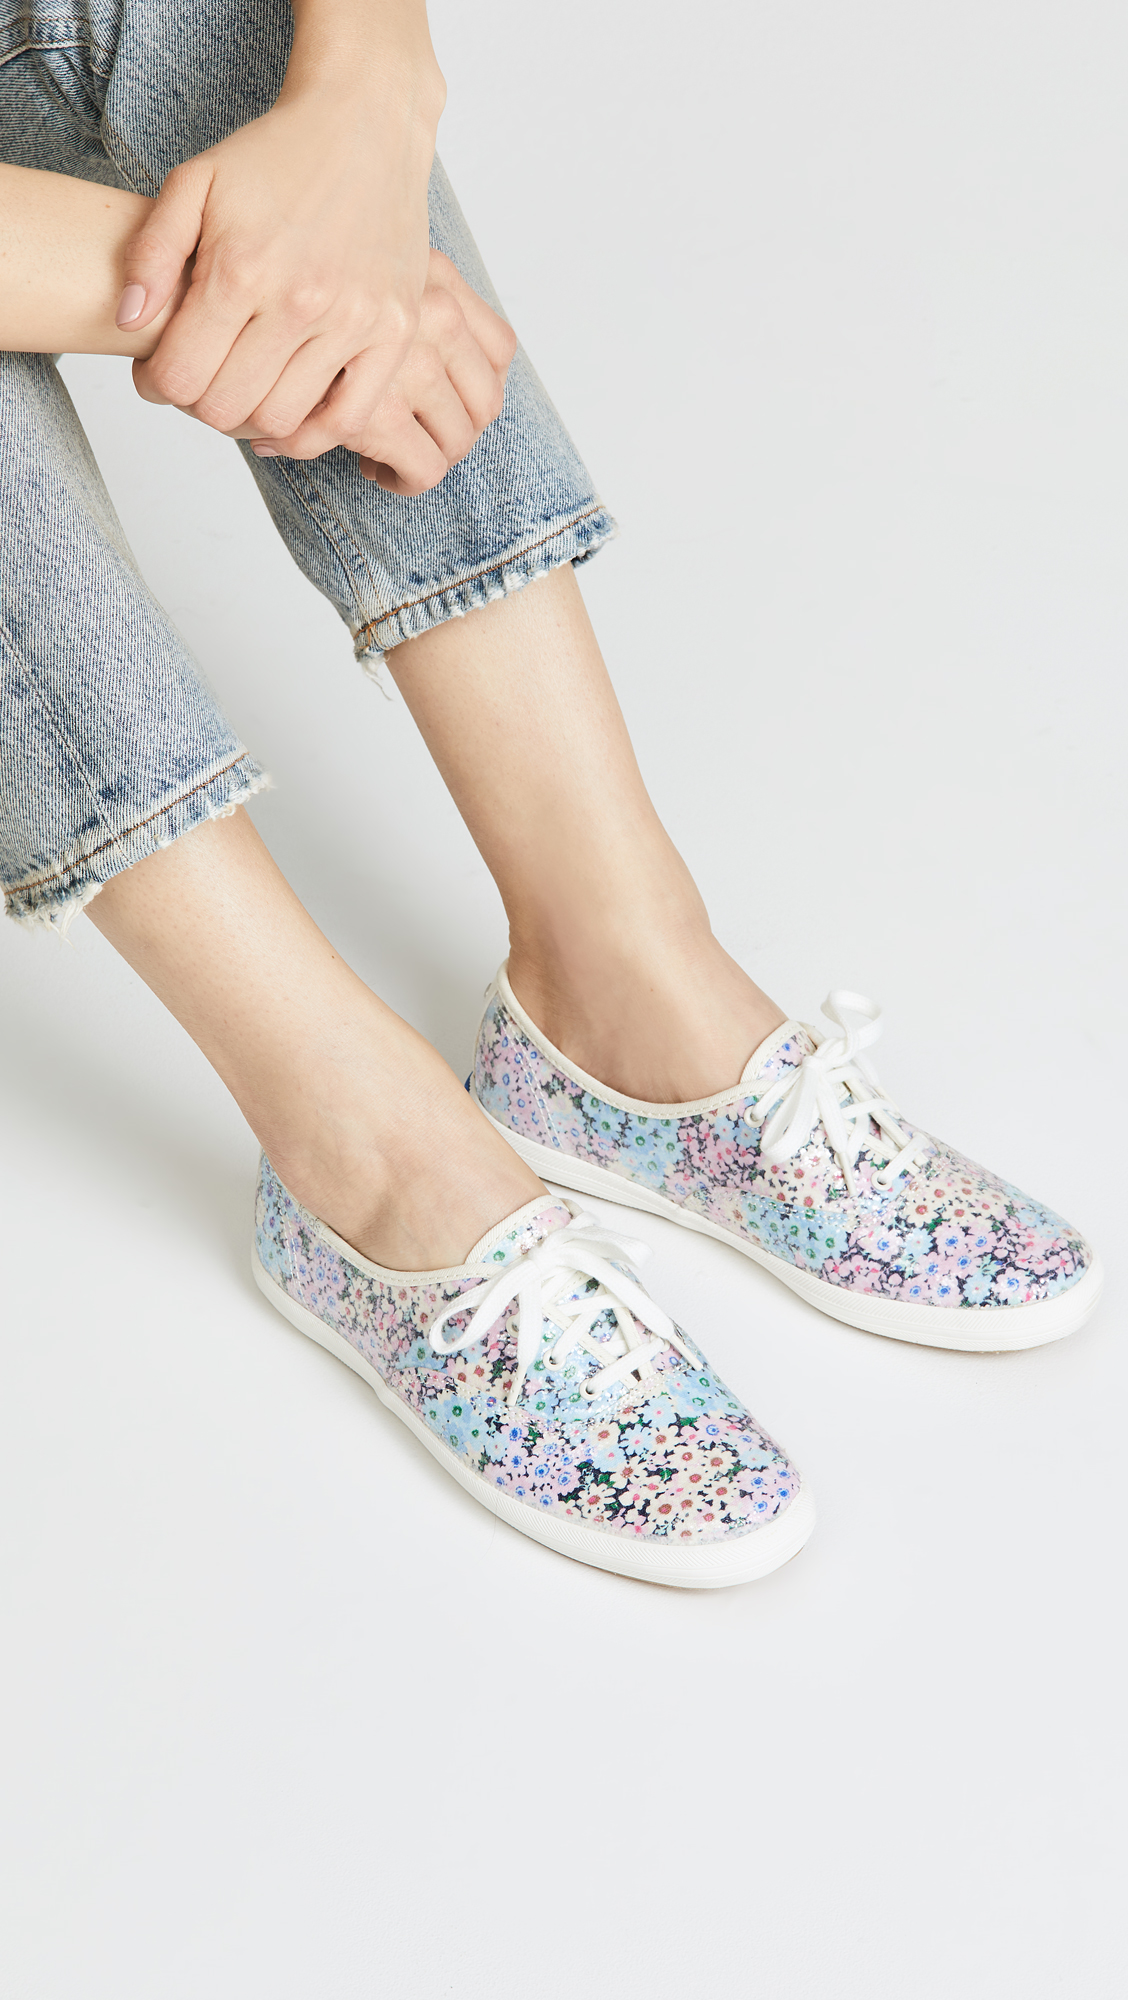 7c8523330fbd Keds x Kate Spade Daisy Garden Glitter Sneakers